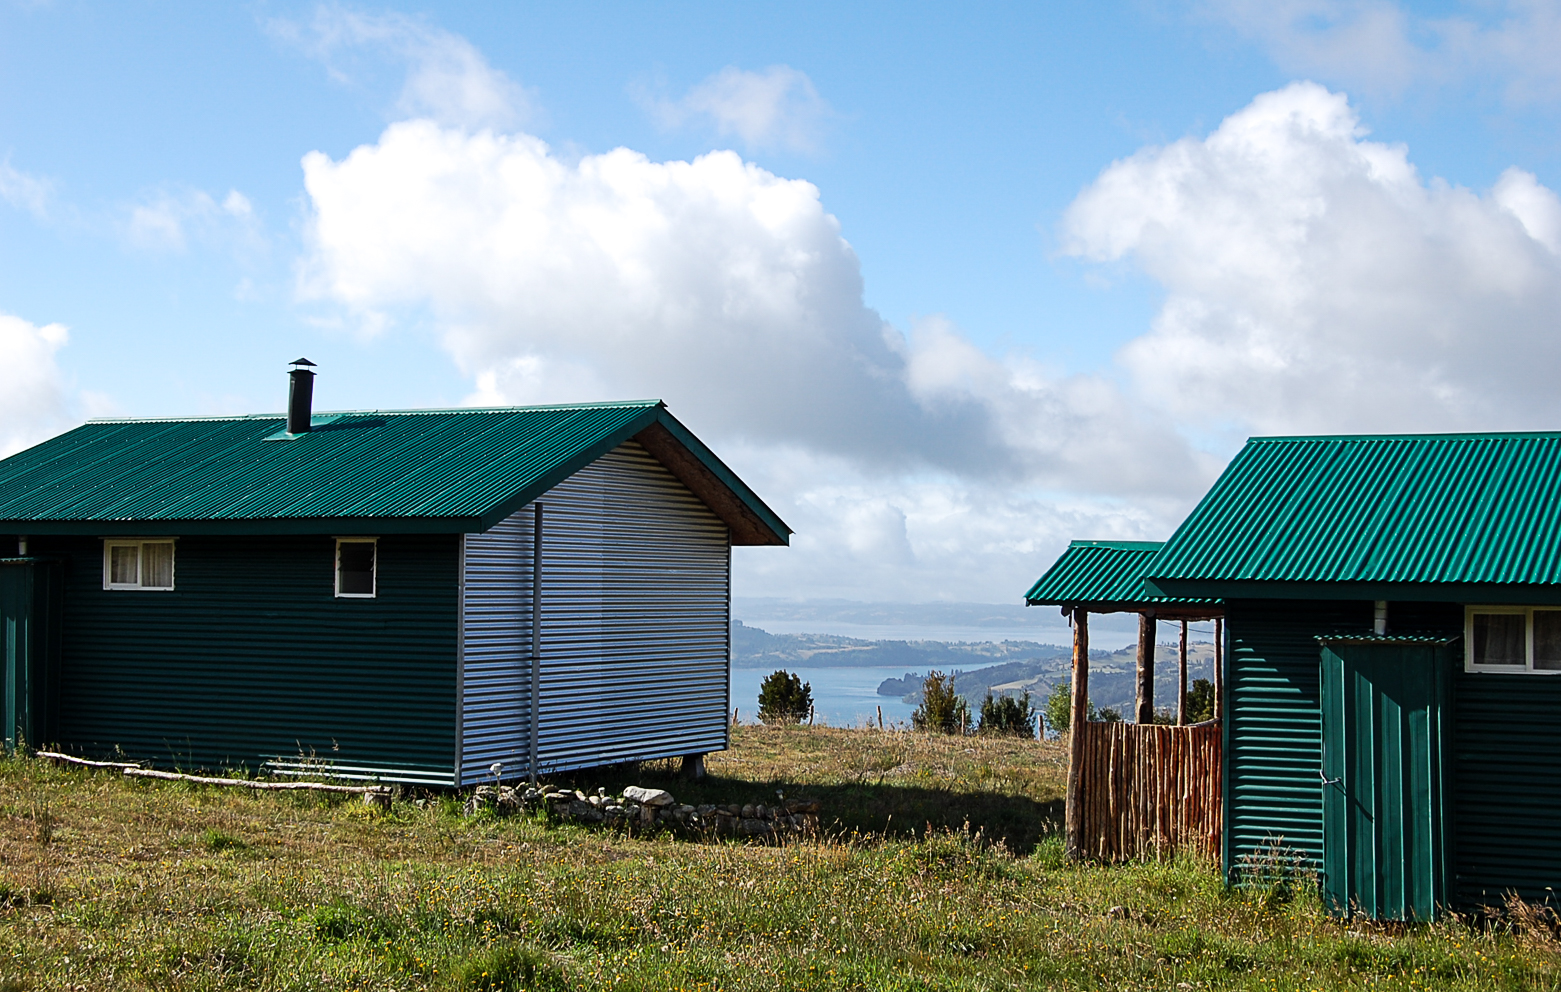 Cabaña Lihuen en Altonalhuitad (Chile)